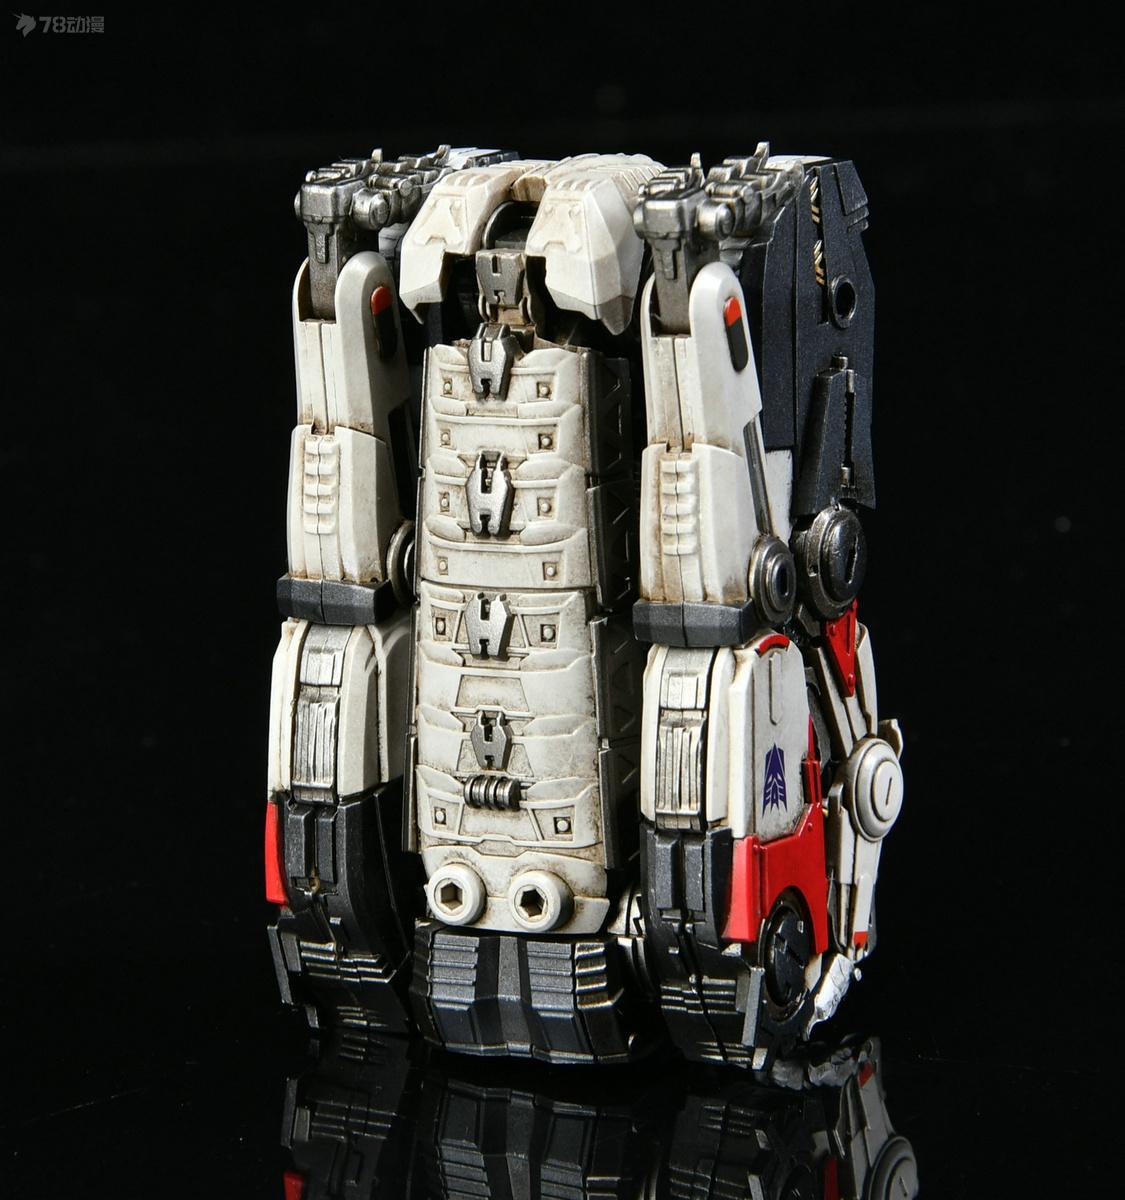 DSC_9812.JPG